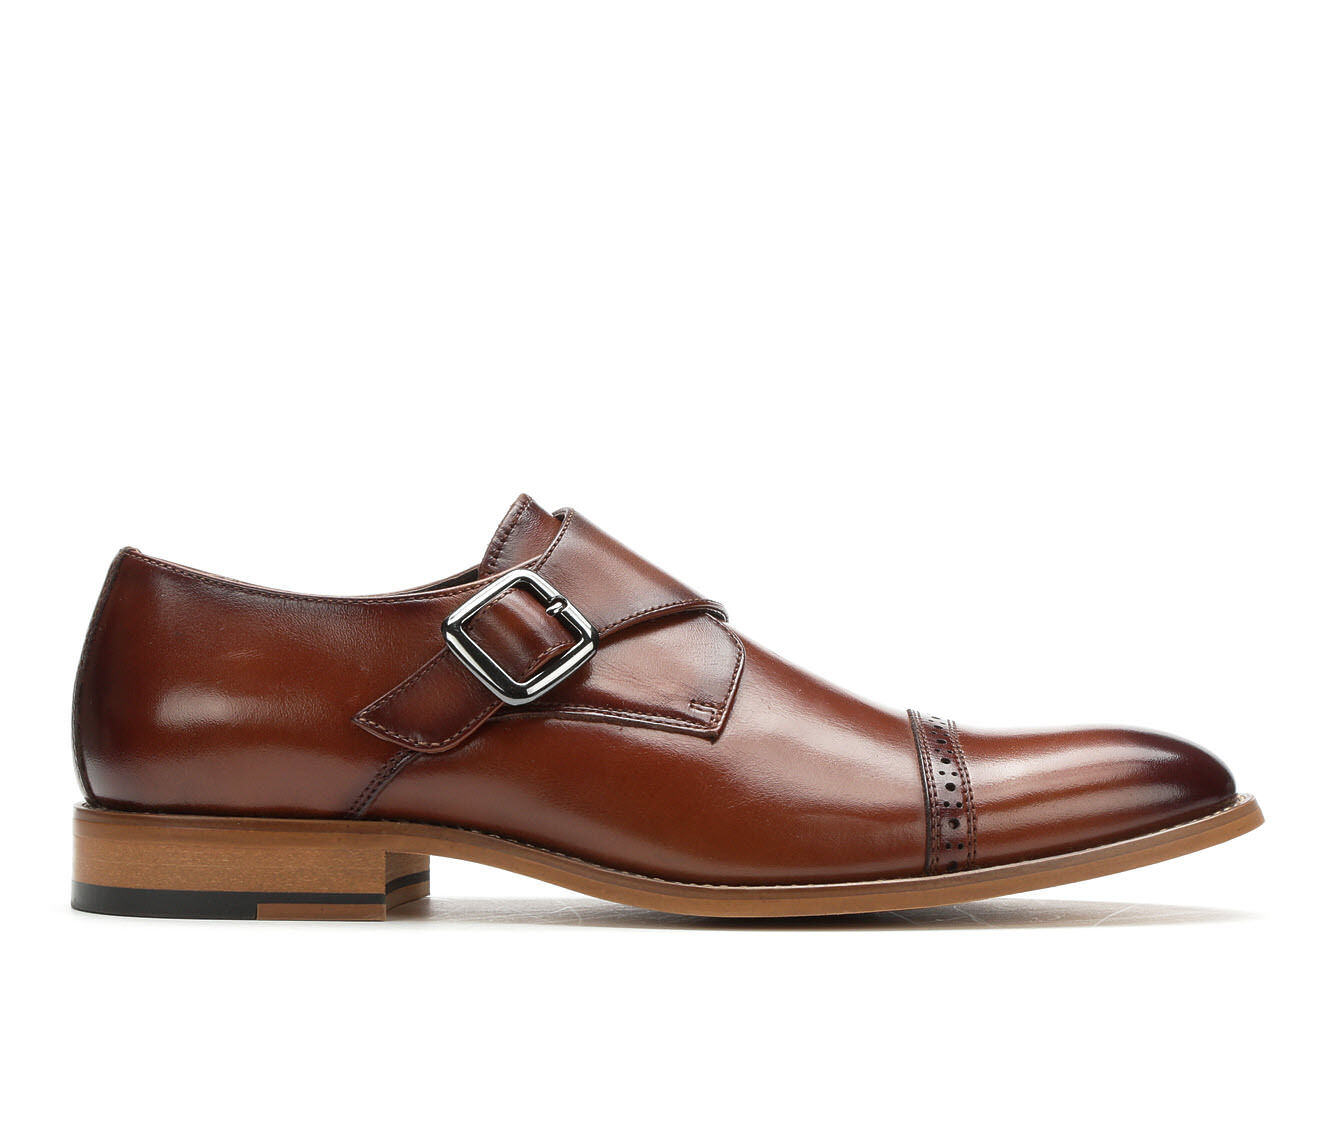 Men's Stacy Adams Desmond Monk Strap Dress Loafers Cognac